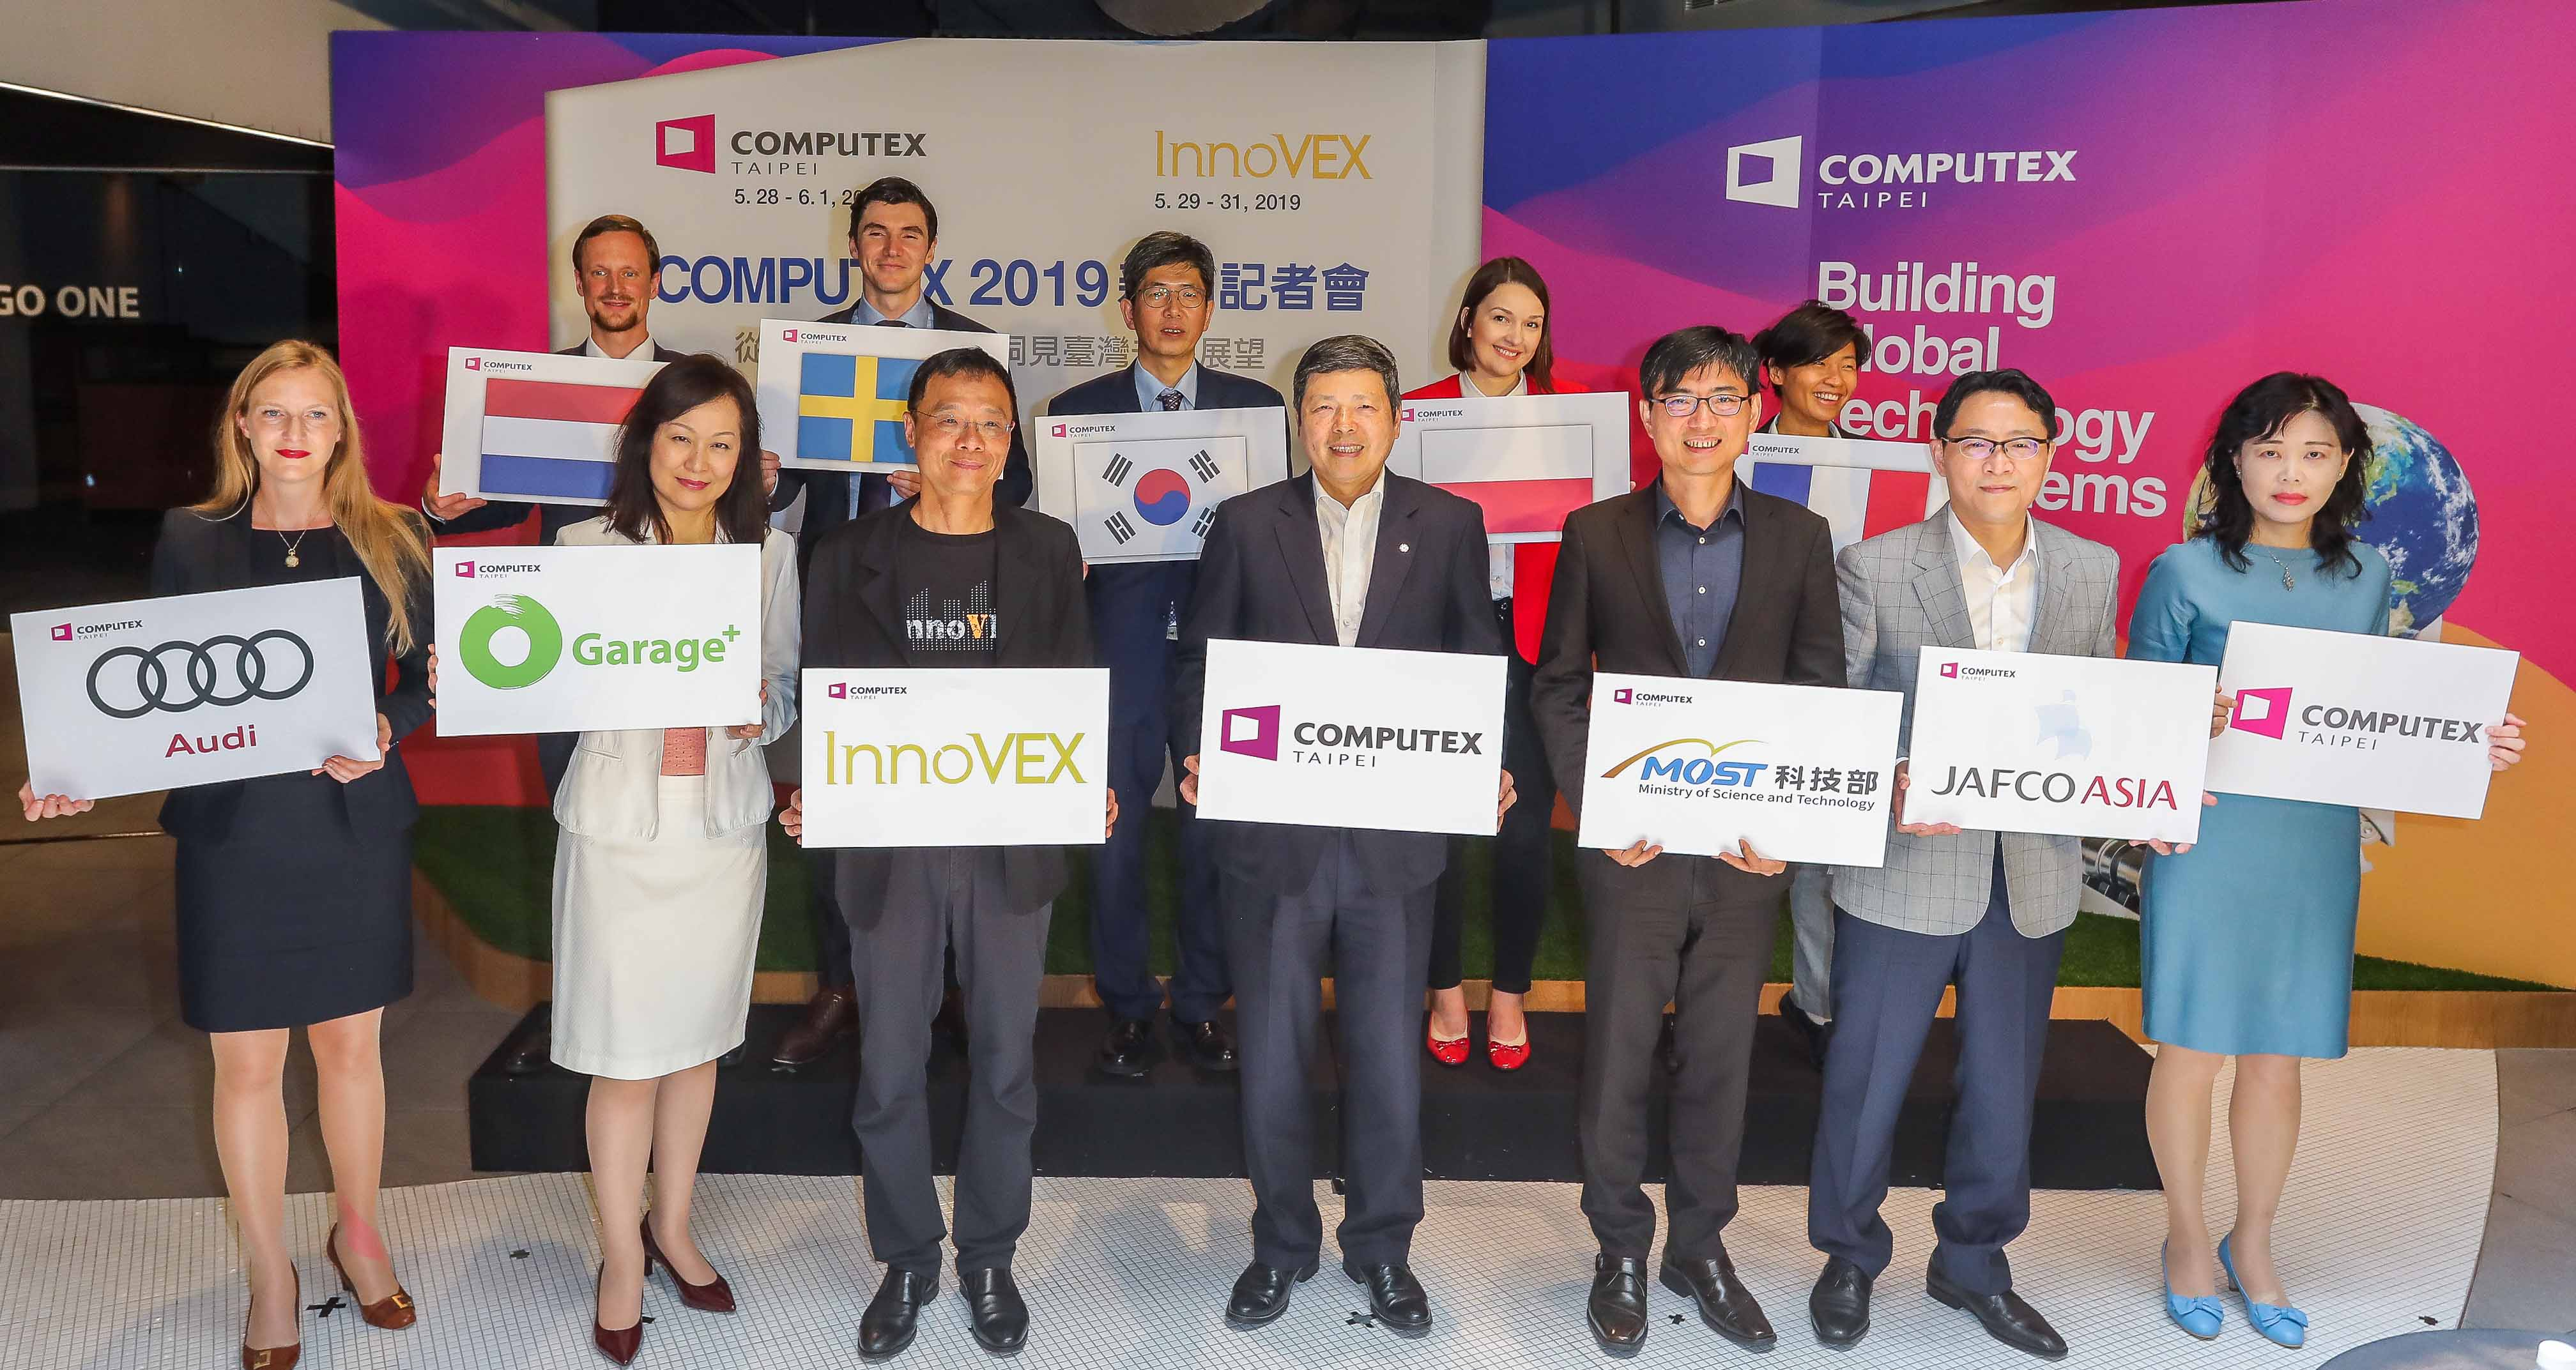 Computex 2019:COMPUTEX 2019從全球新創趨勢  洞見臺灣未來展望 InnoVEX展區匯集完整生態系 展現豐沛創新能量 | T客邦